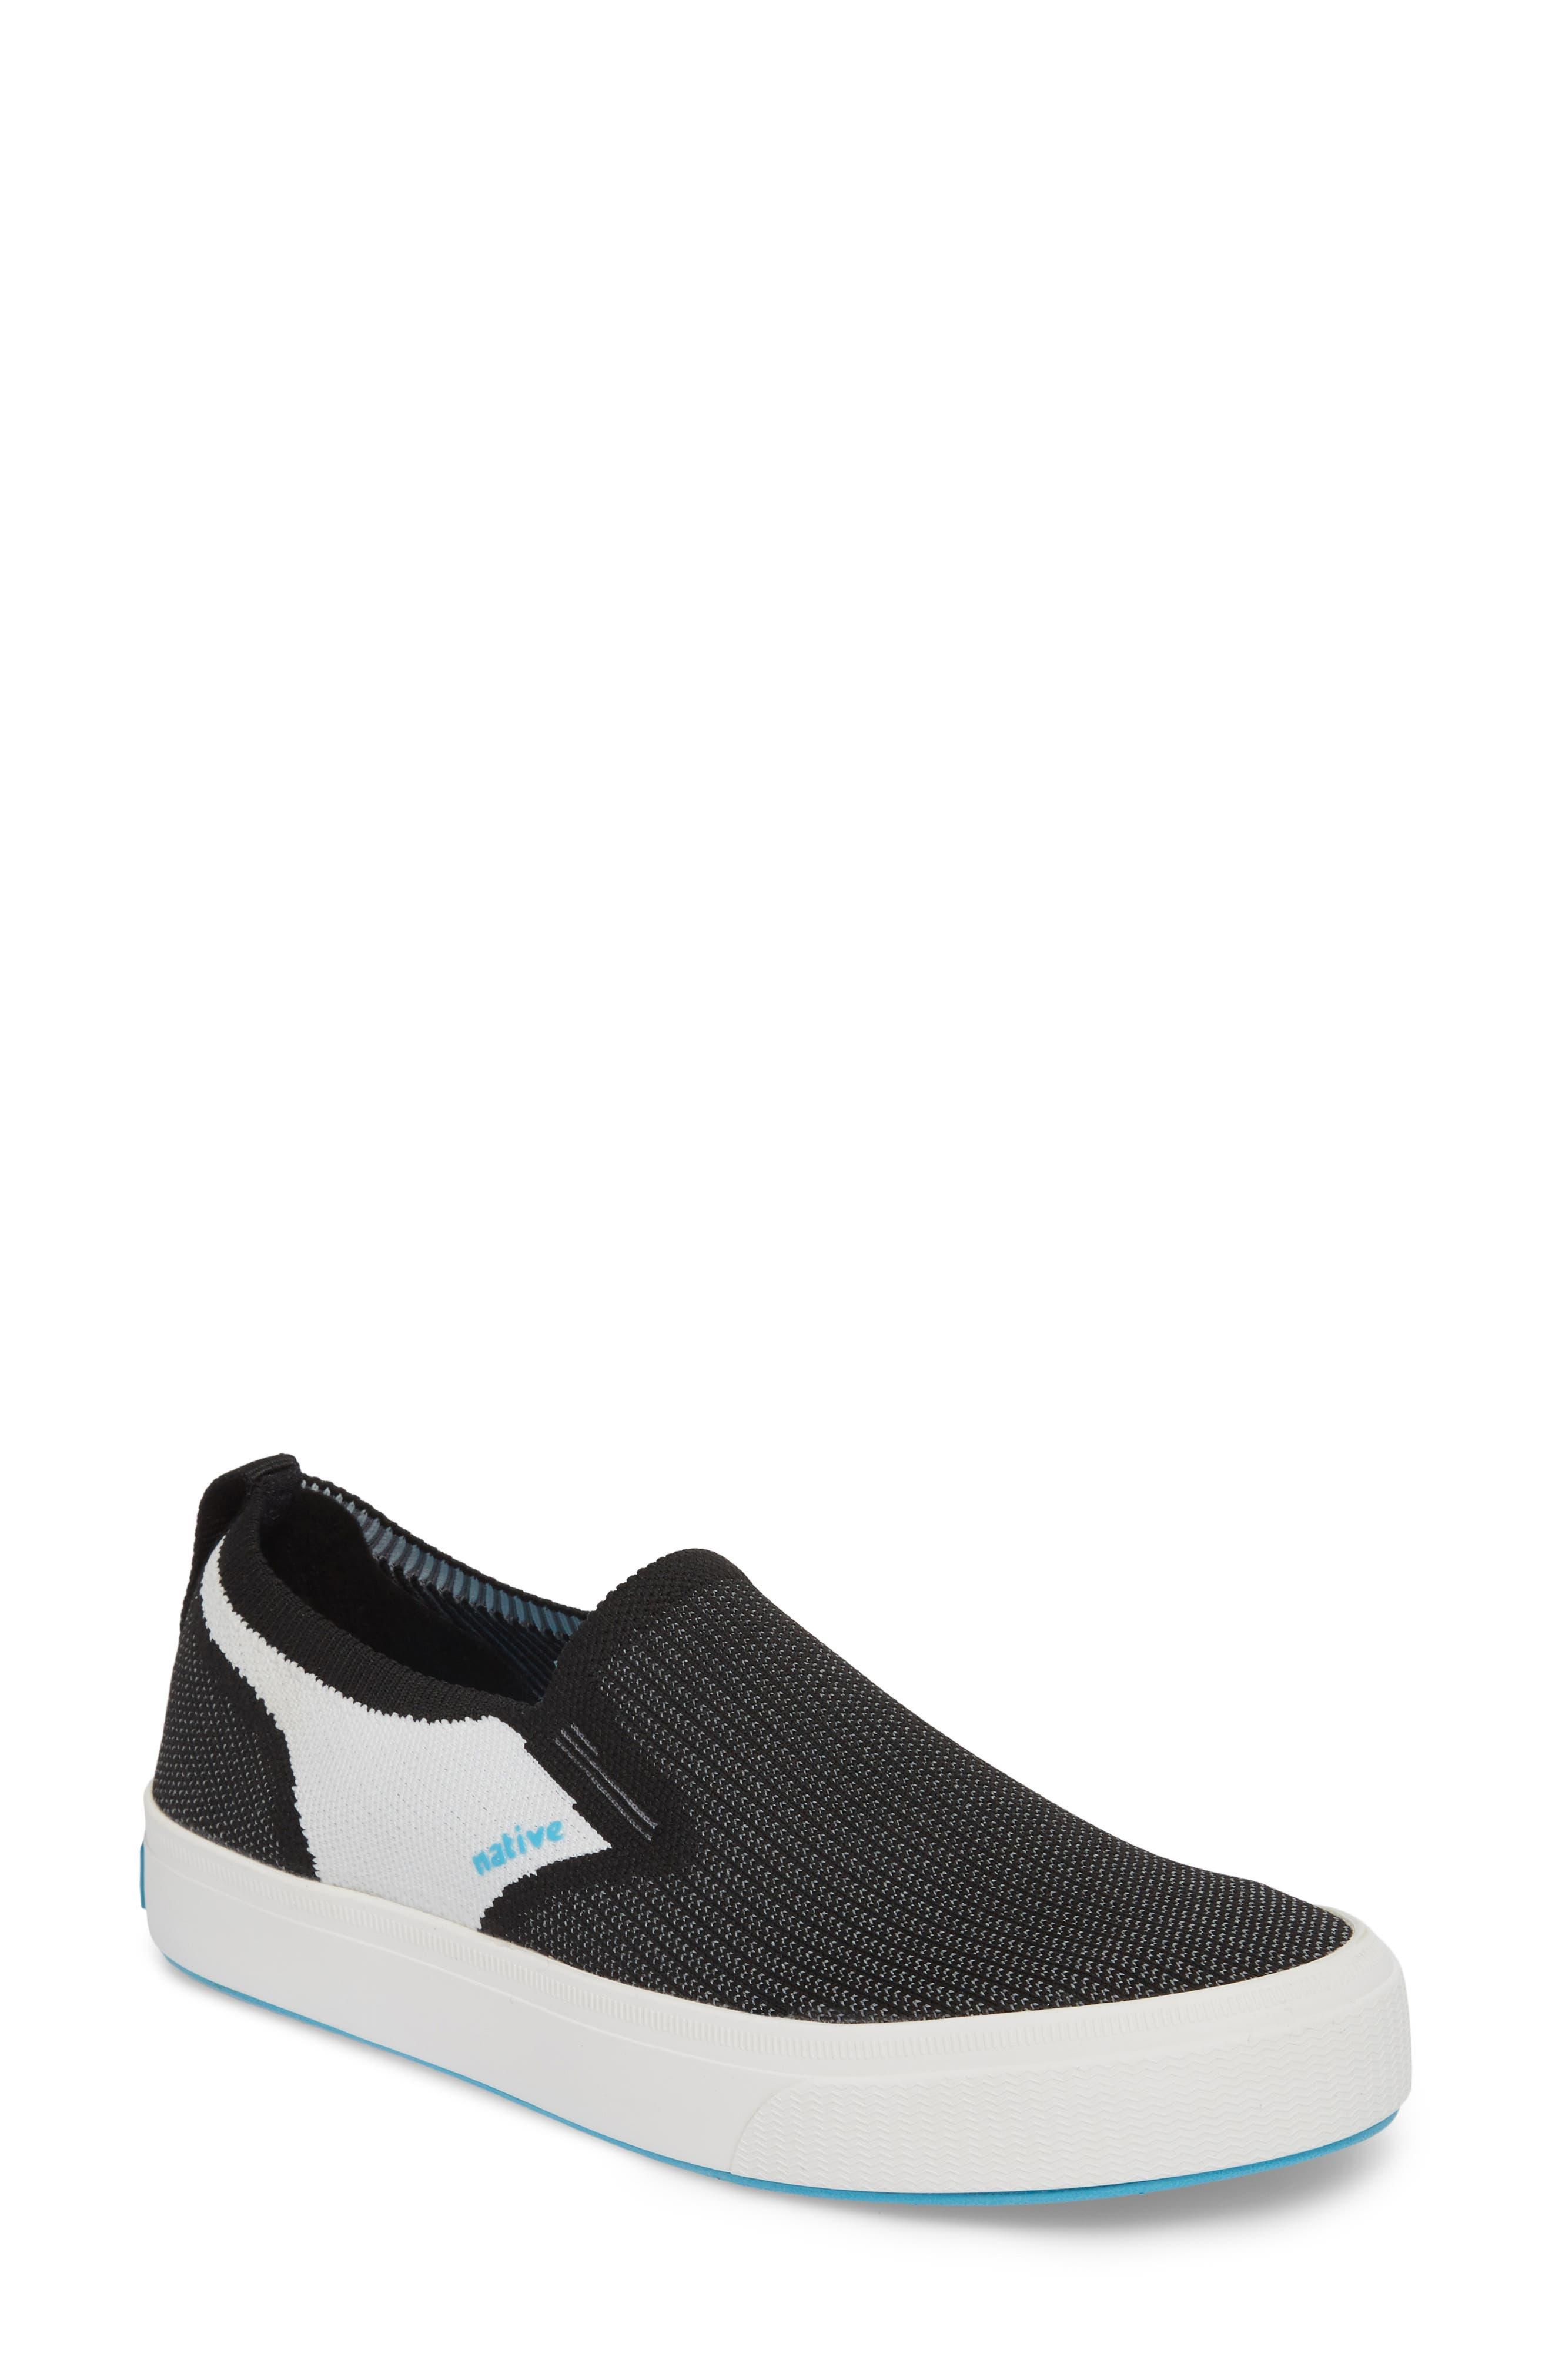 Miles Liteknit Slip-On Sneaker,                         Main,                         color, JIFFY BLACK/ SHELL WHITE